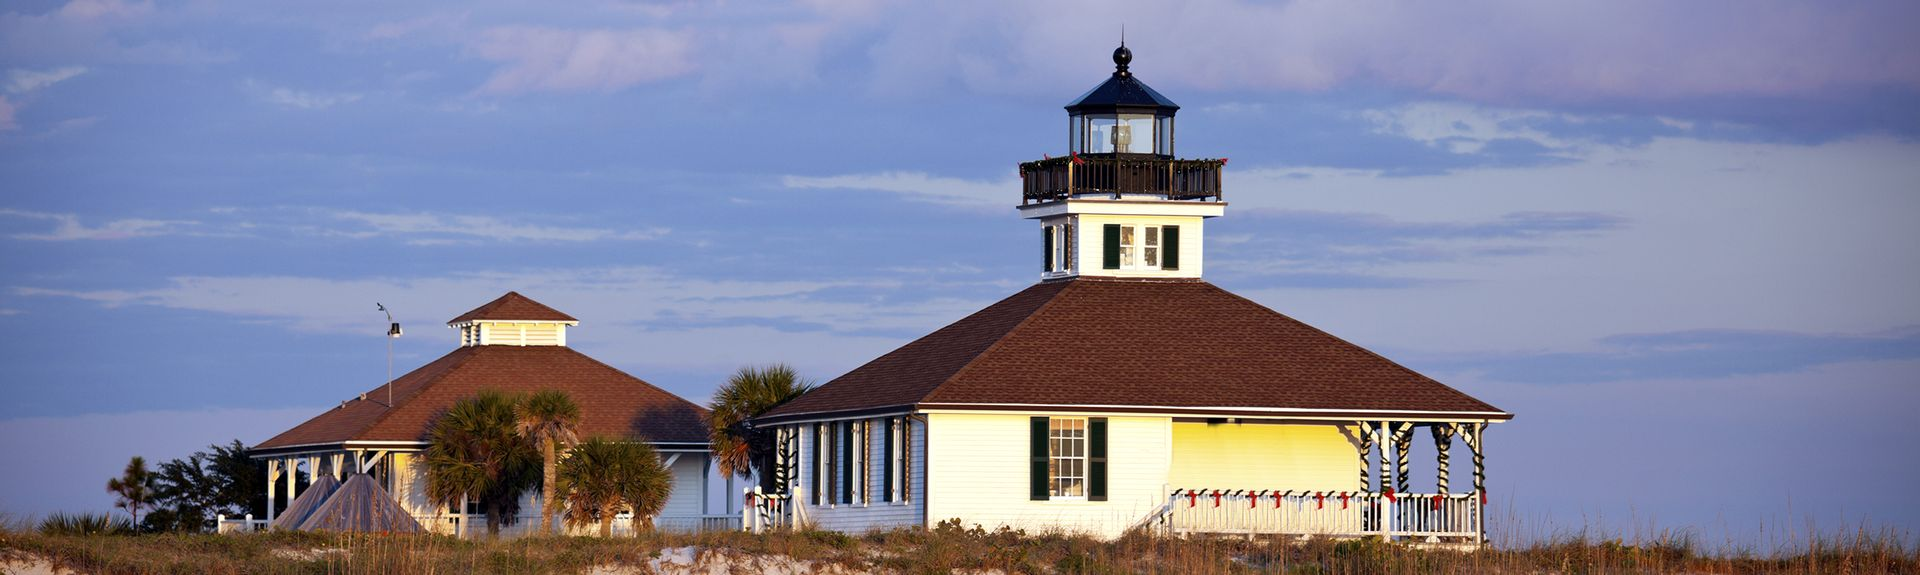 Gasparilla Island (Insel), Florida, USA